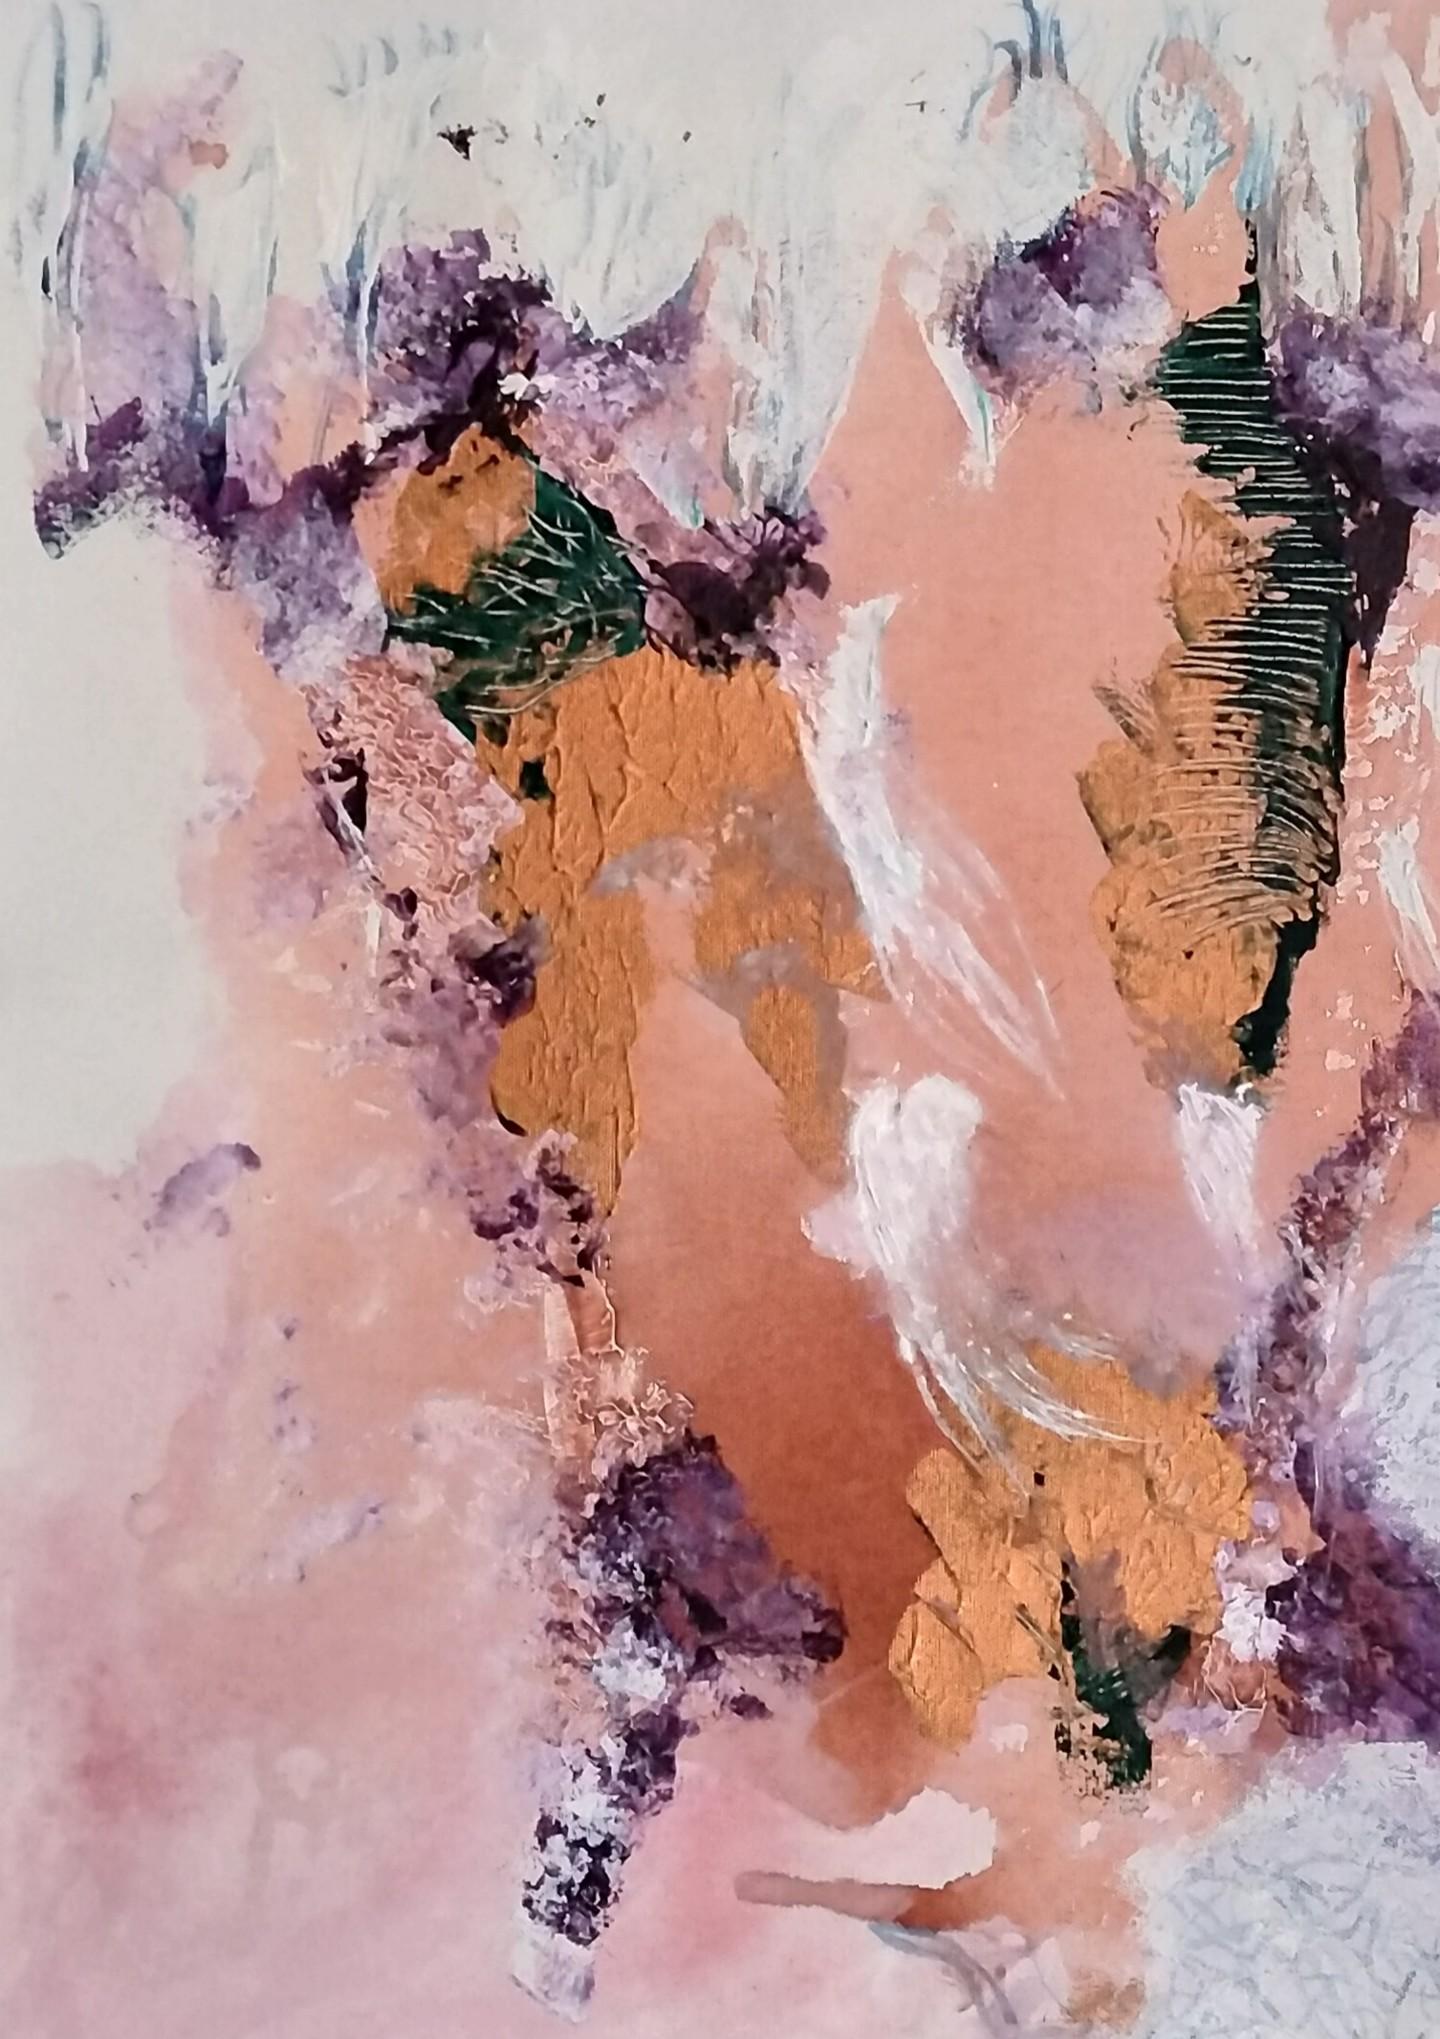 Atignas Art - Created with love - I